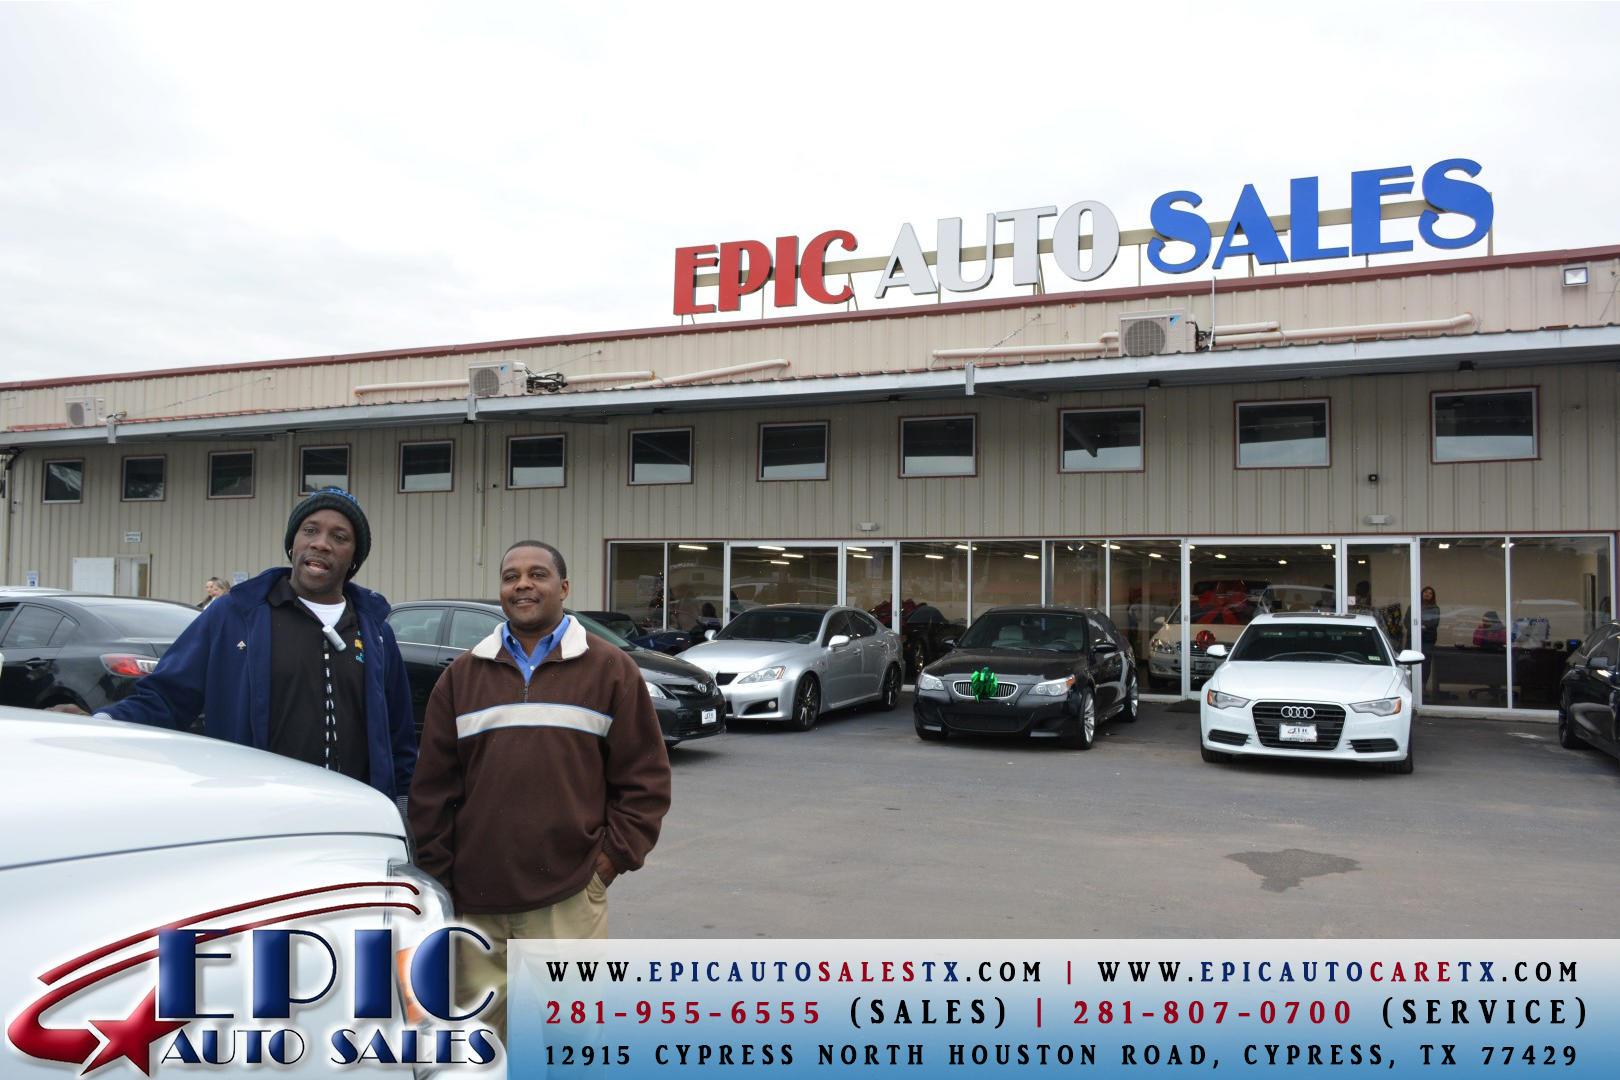 Epic Auto Sales image 18